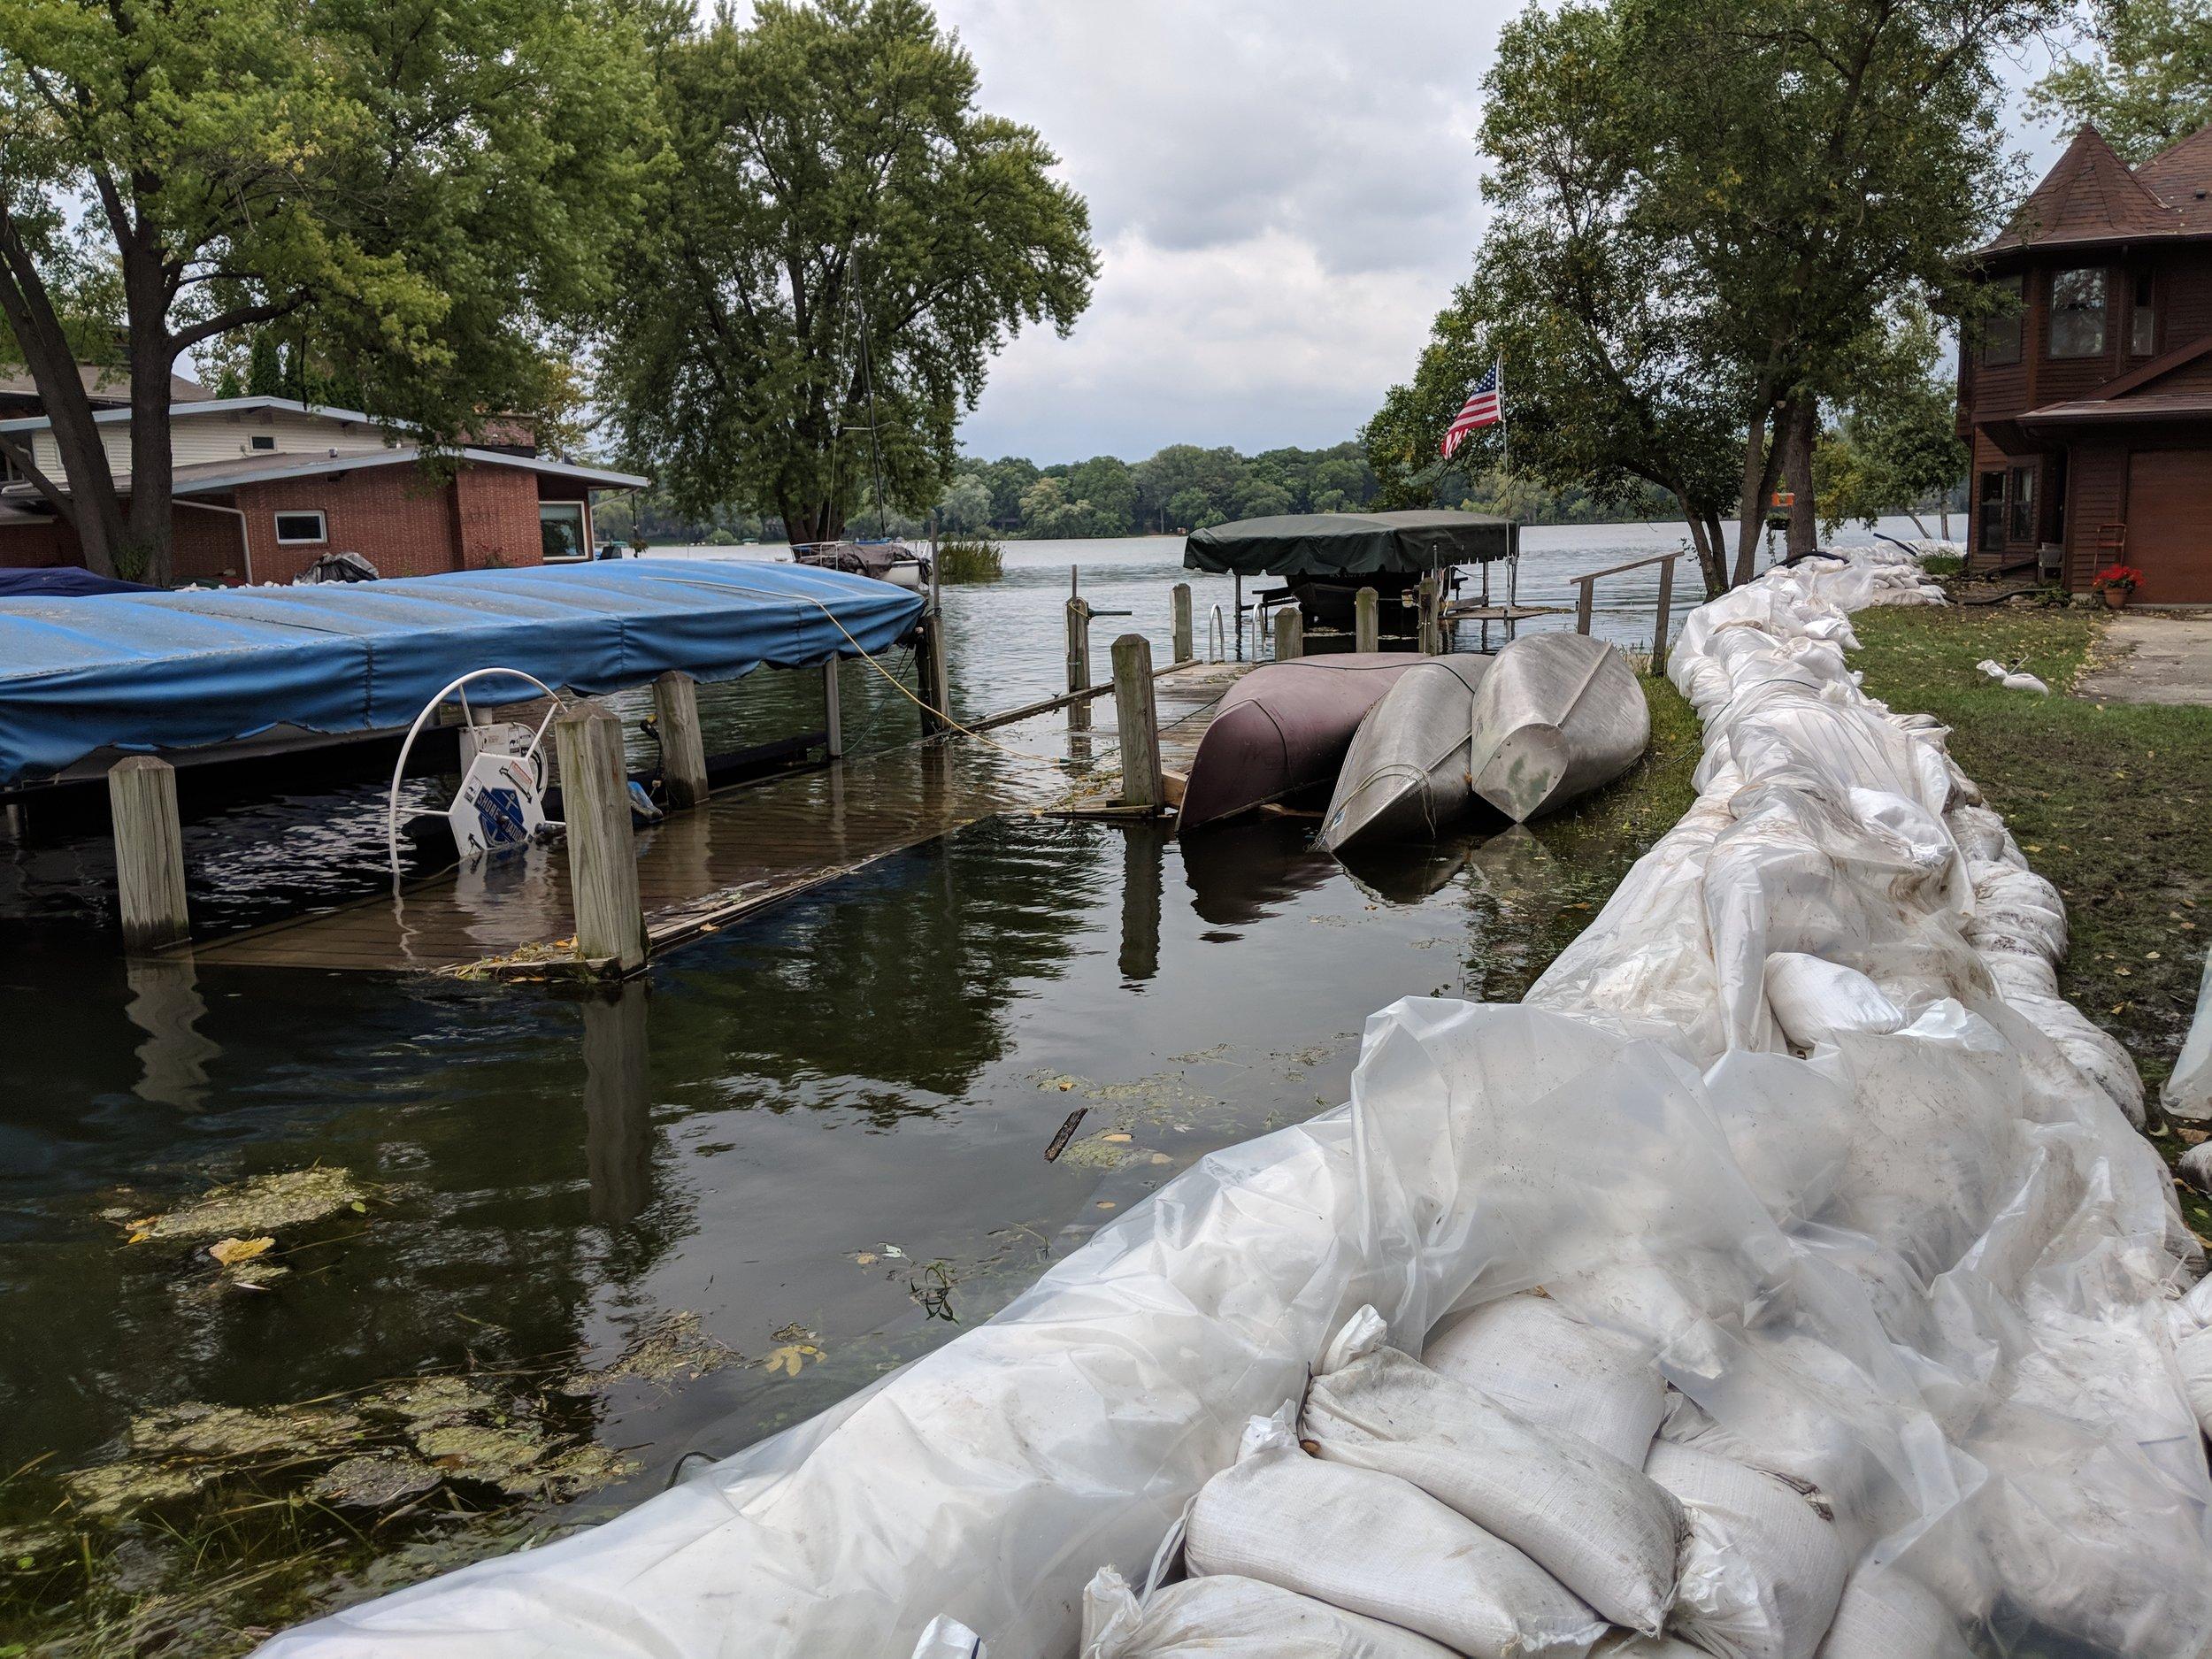 2018 Flooding on lake monona